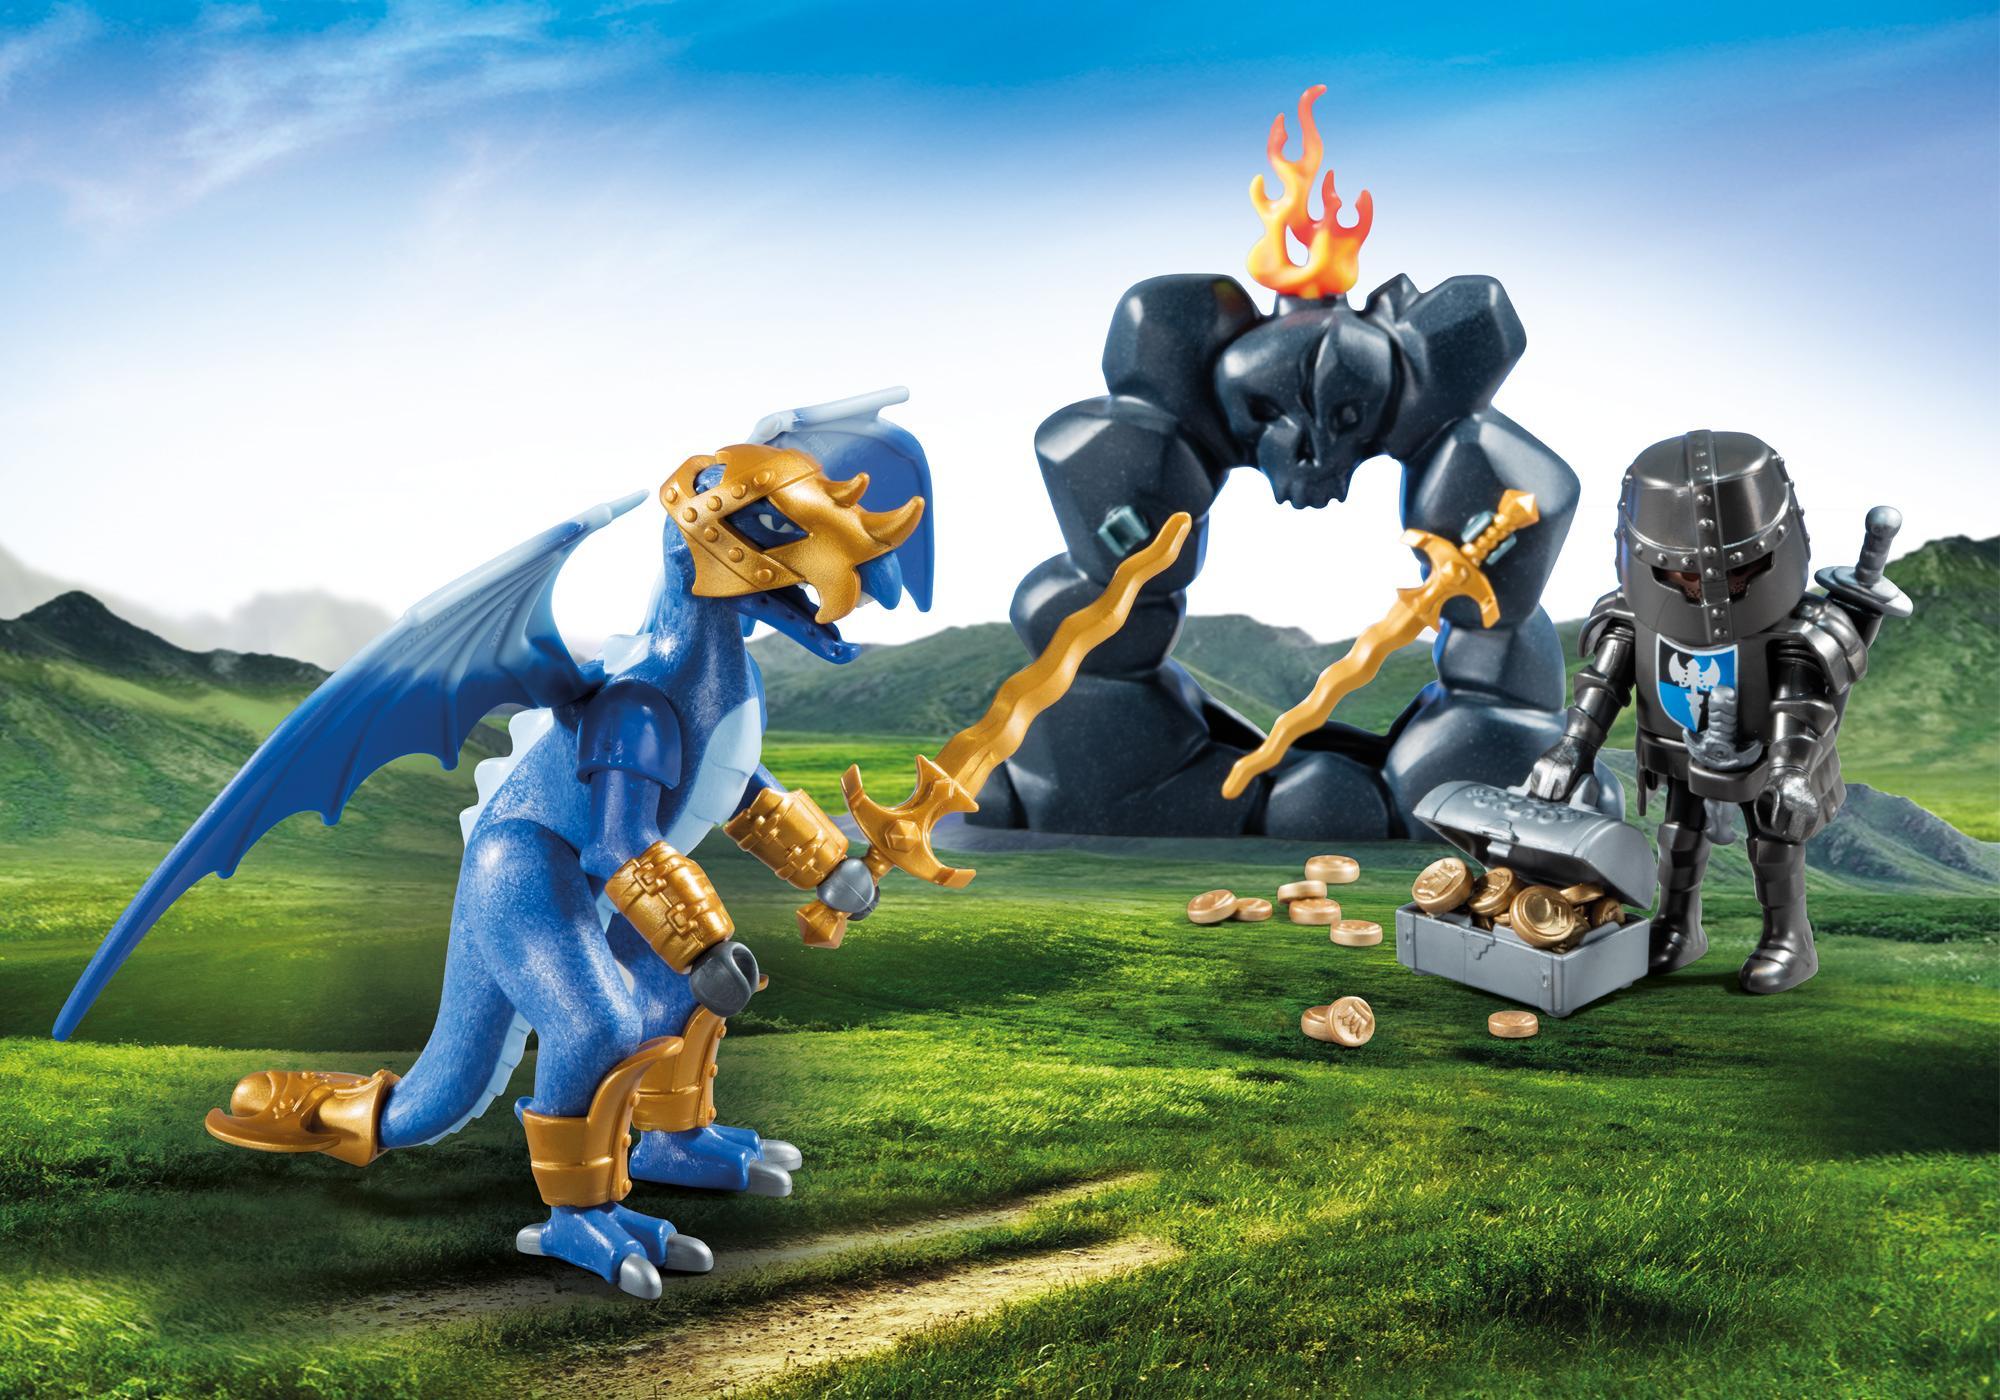 http://media.playmobil.com/i/playmobil/5657_product_extra1/Dragon Knights Carry Case